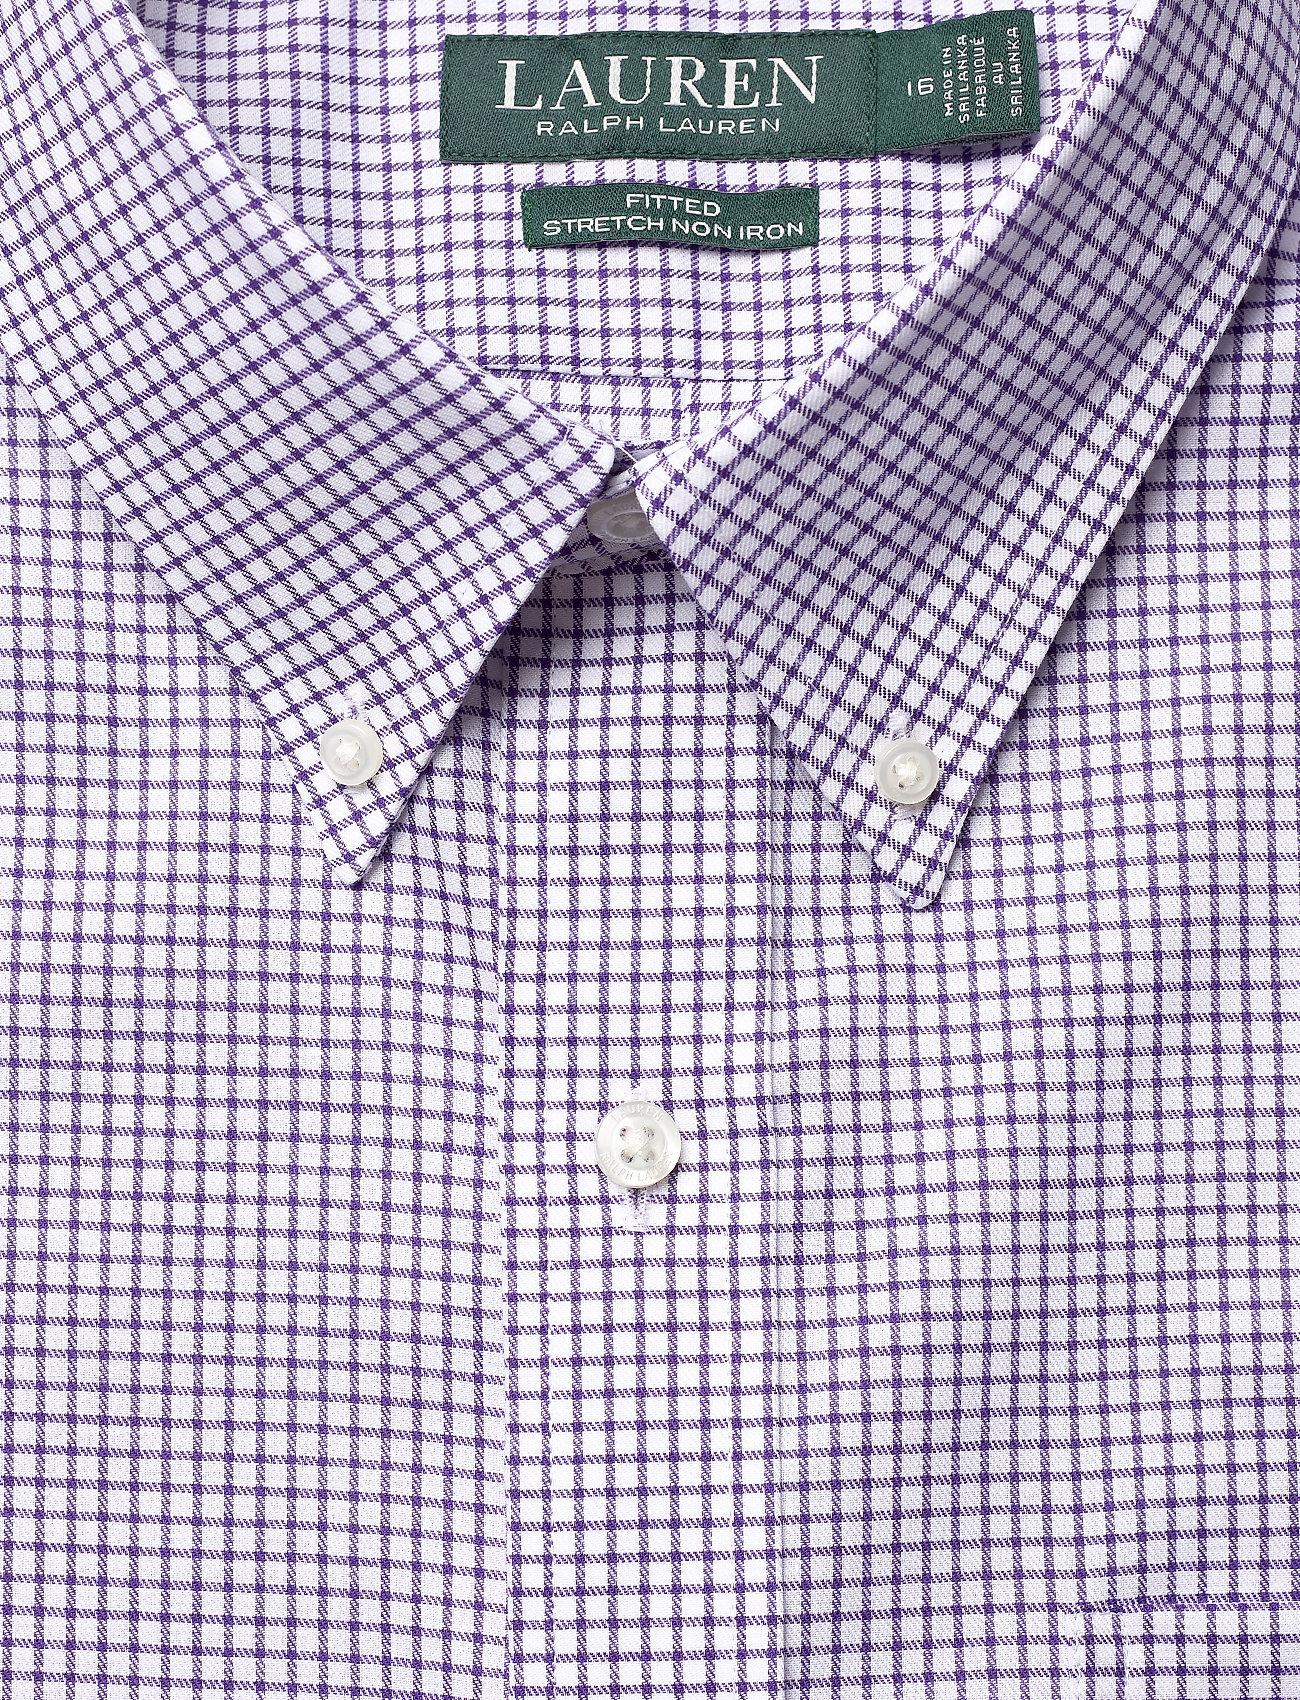 Ft Bd Pkt Lo-dress Shirt (5526b White/ Roya) (419.40 kr) - Lauren Ralph Lauren